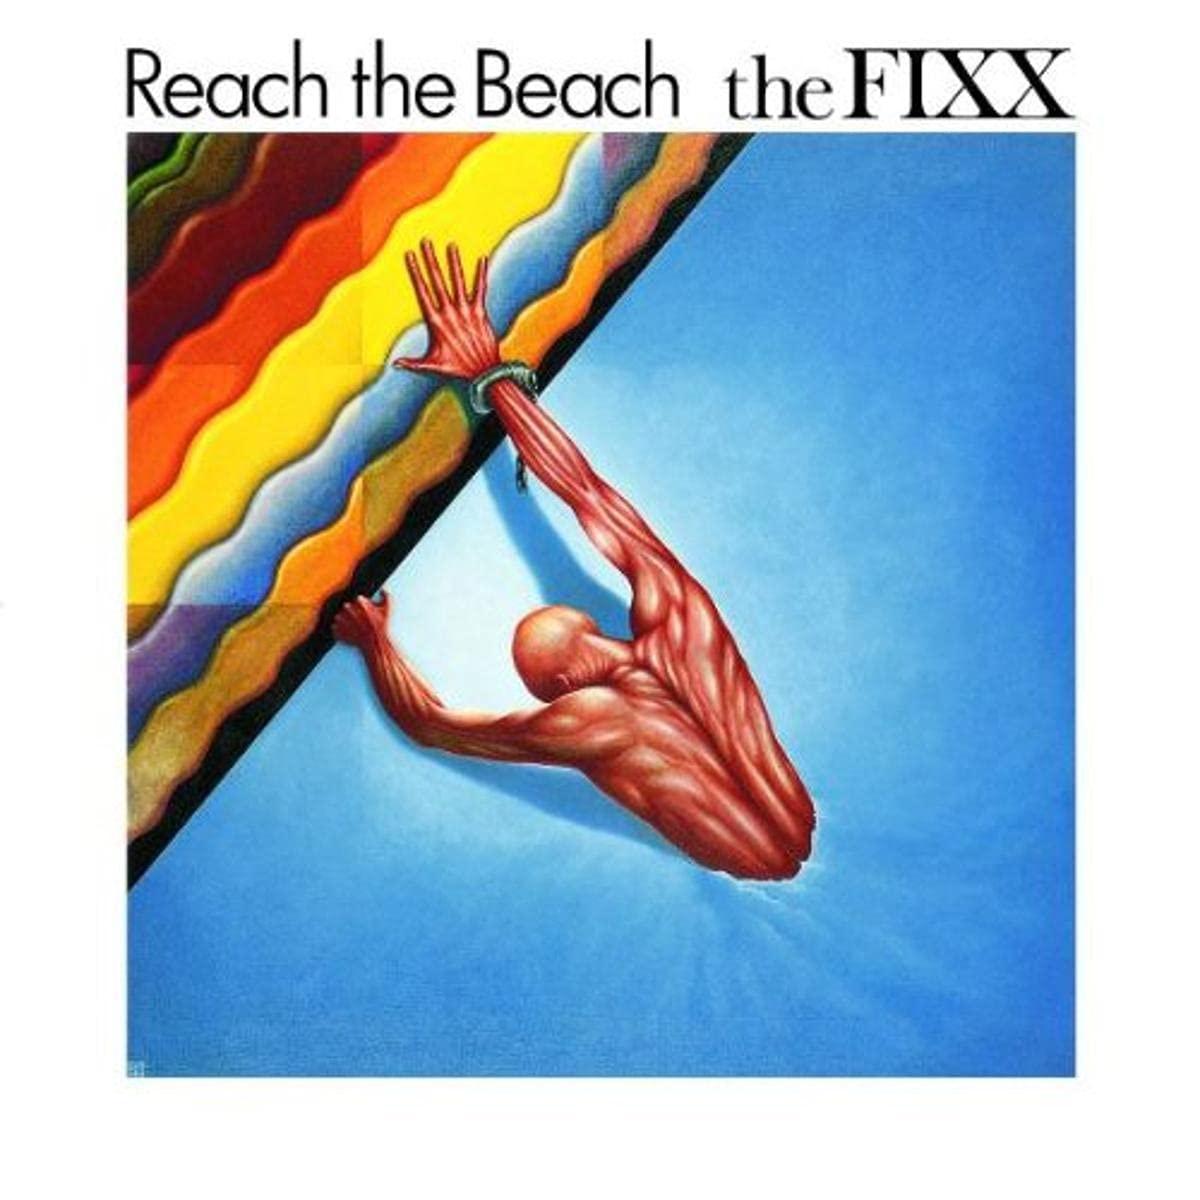 The Fixx - Reach The Beach (Remastered) - Amazon.com Music